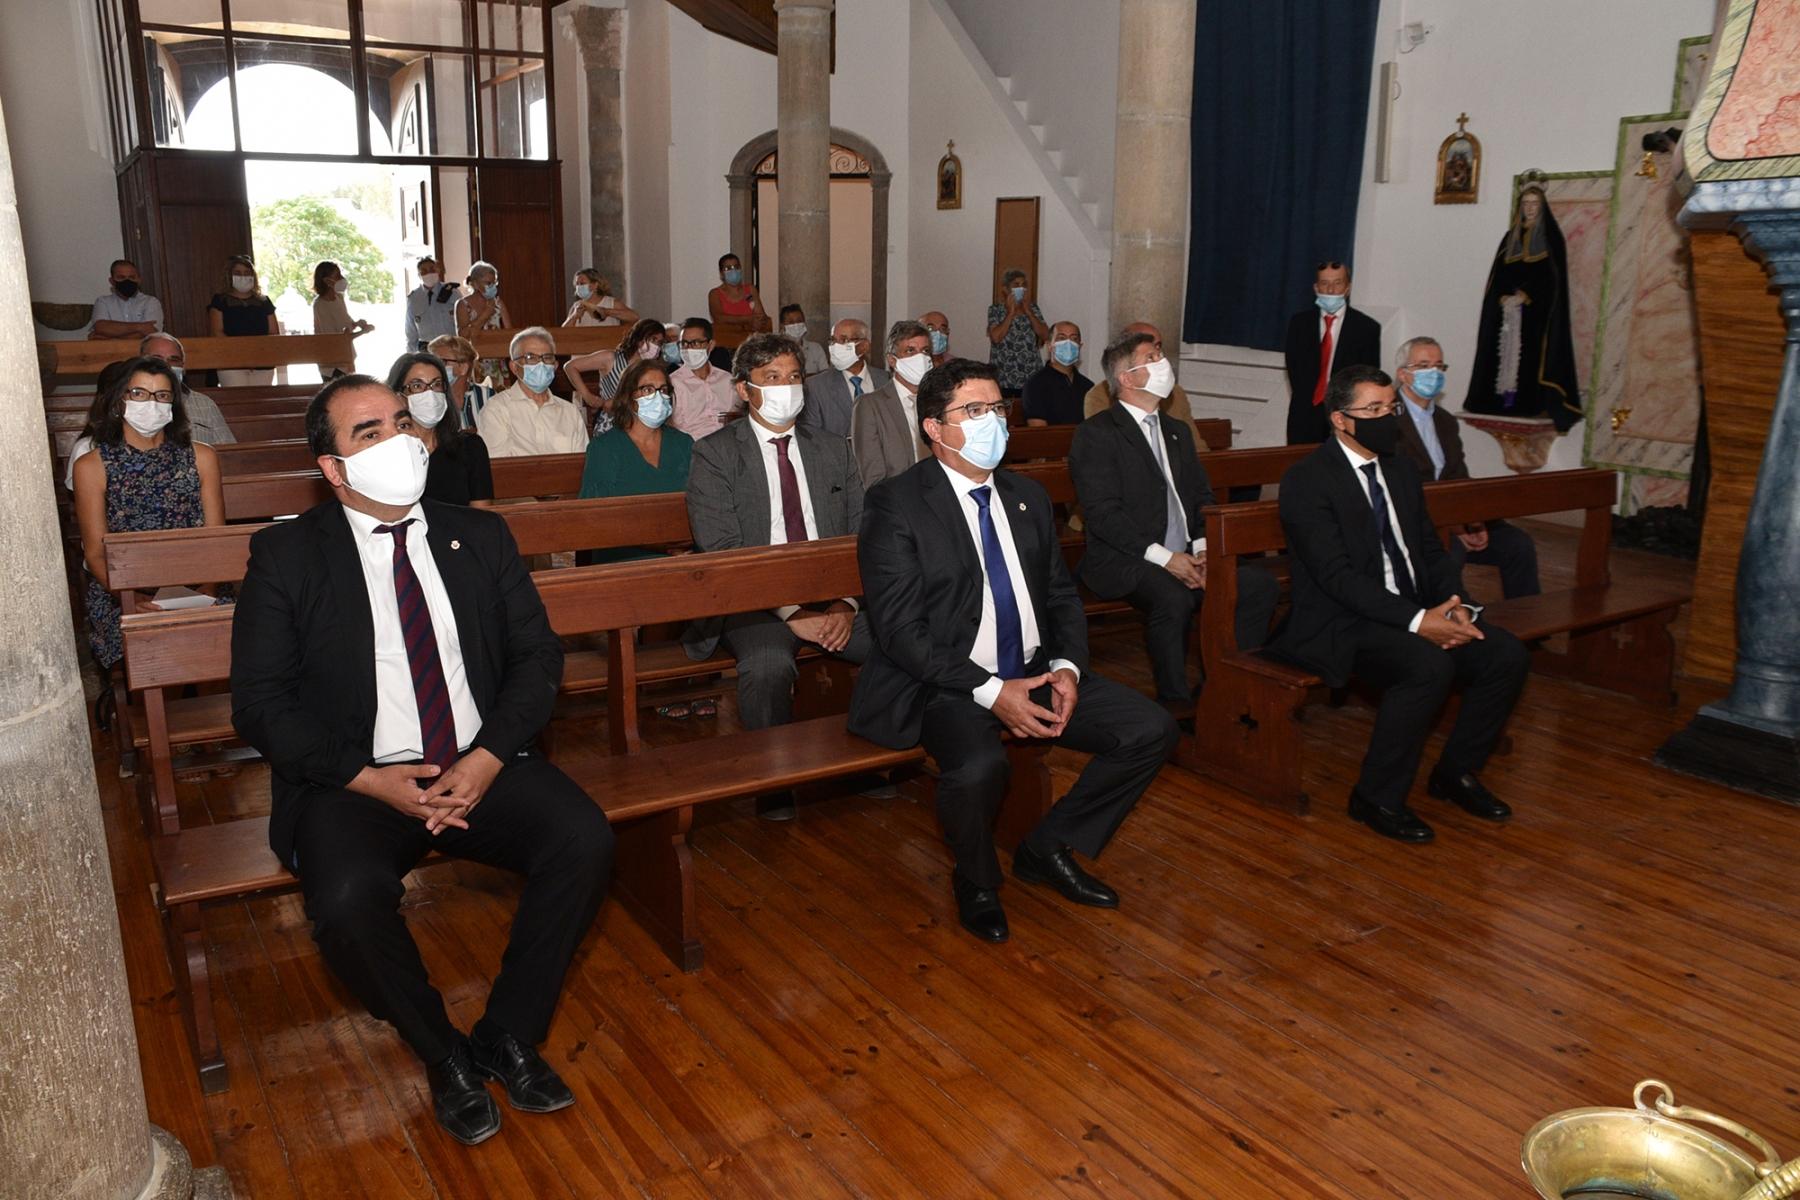 Inauguracao_bencao_obras_restauro_igreja_alcoutim-24